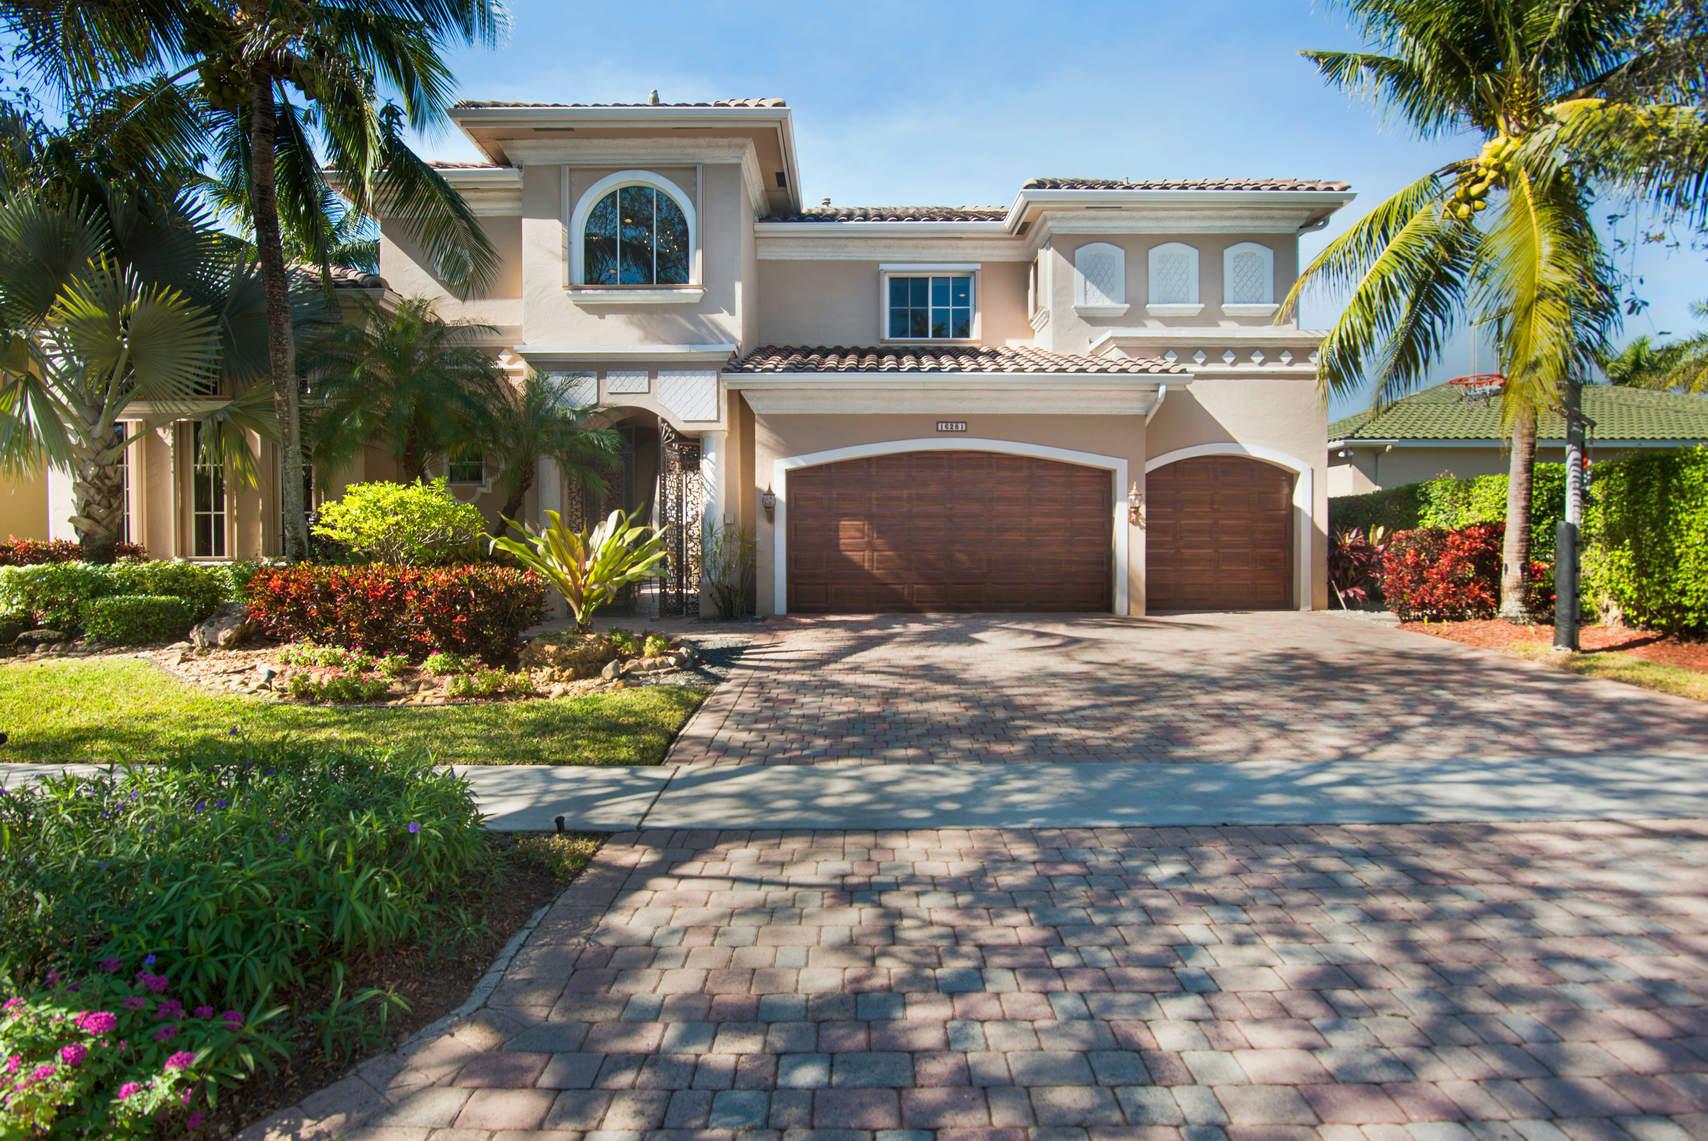 16281 Via Venetia E, Delray Beach, FL 33484